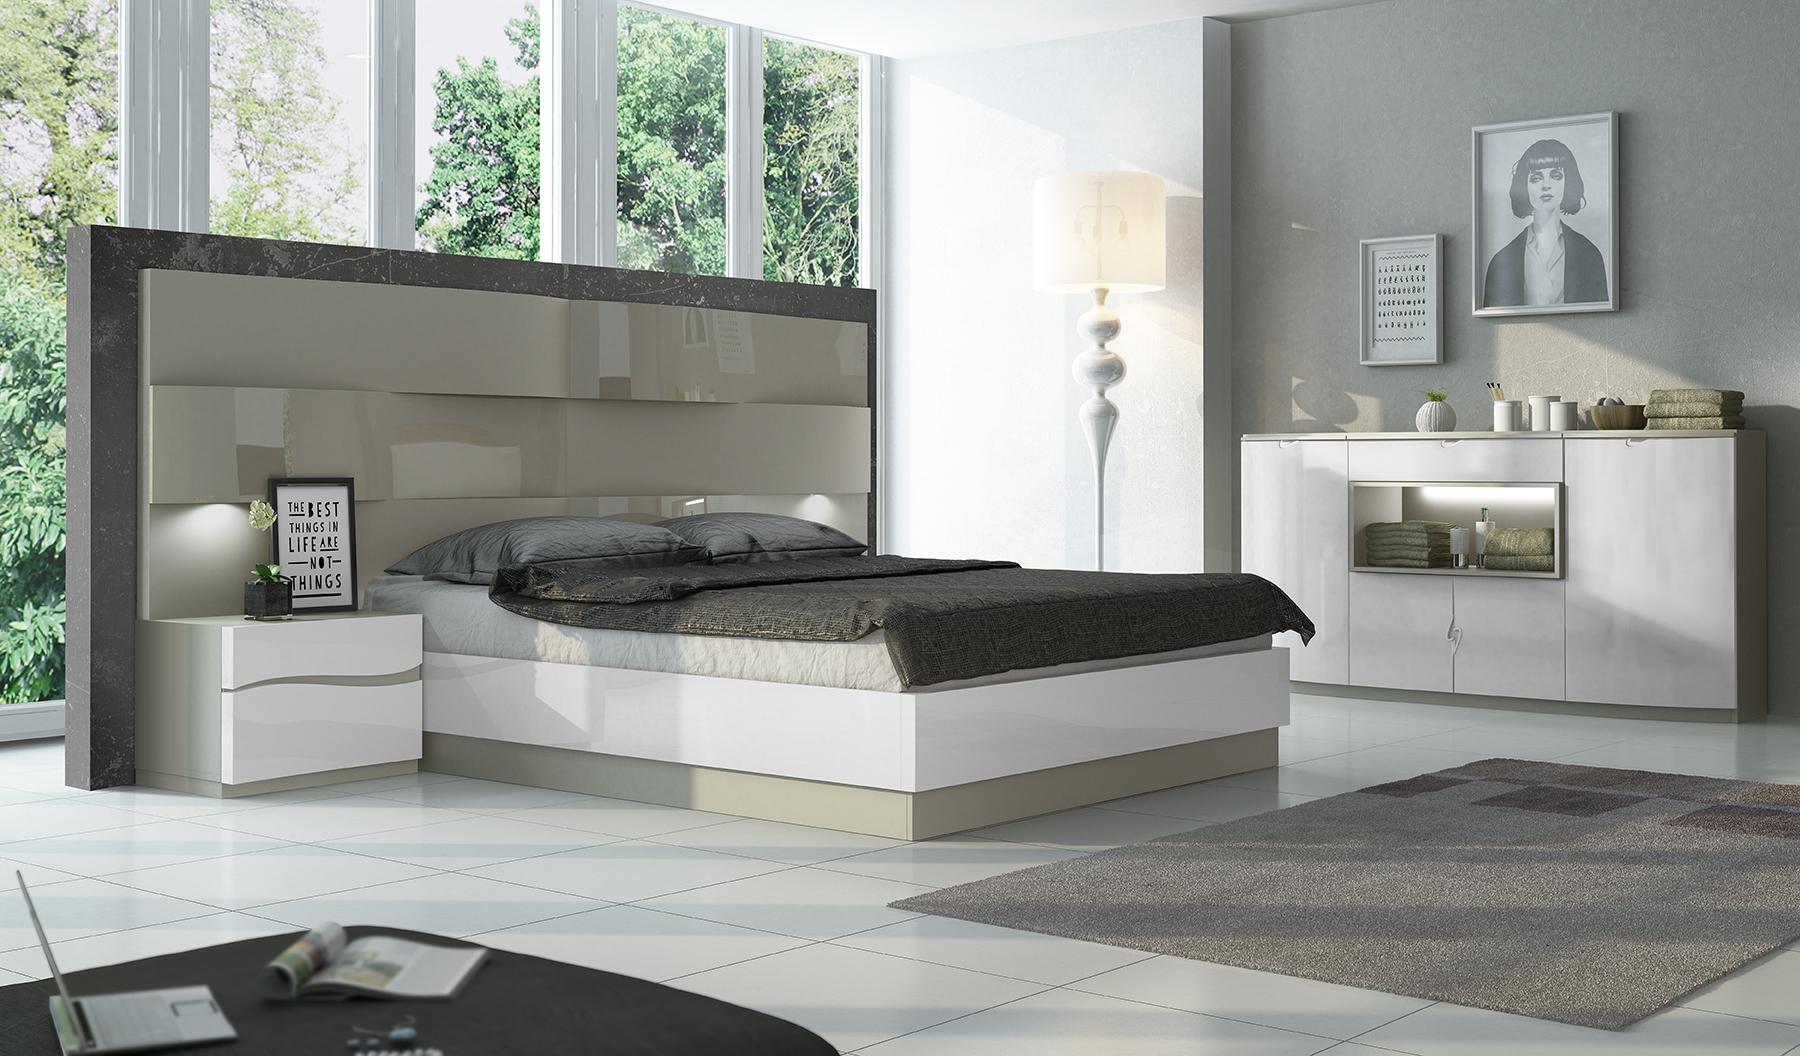 Unique Wood Designer Bedroom Furniture Sets Houston Texas FeniciaSpainComposition21